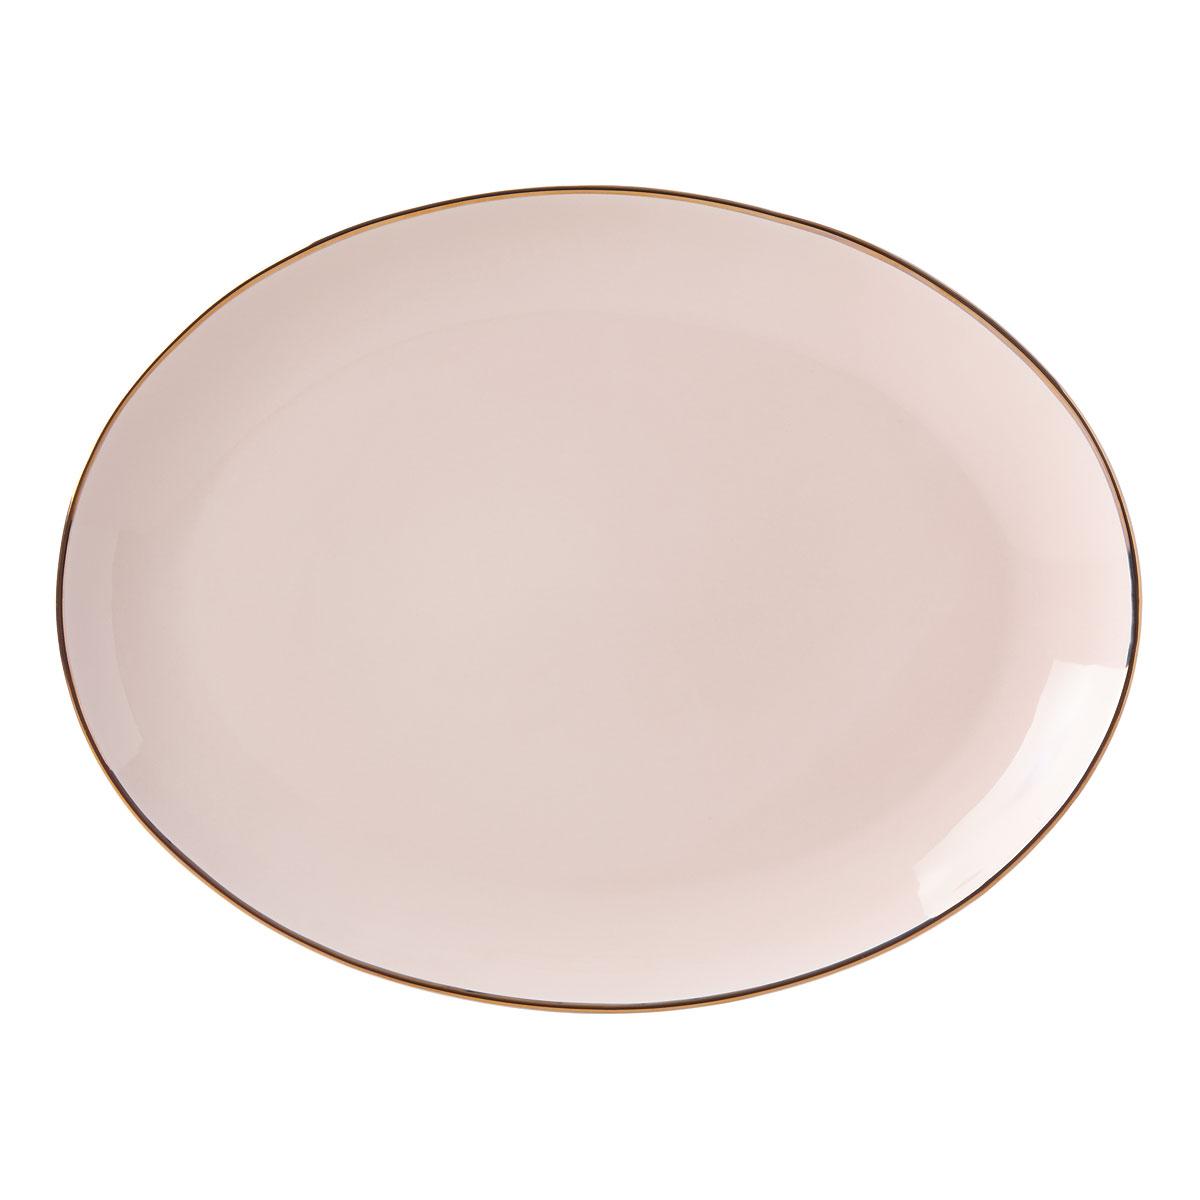 Lenox Trianna Blush Dinnerware Oval Platter